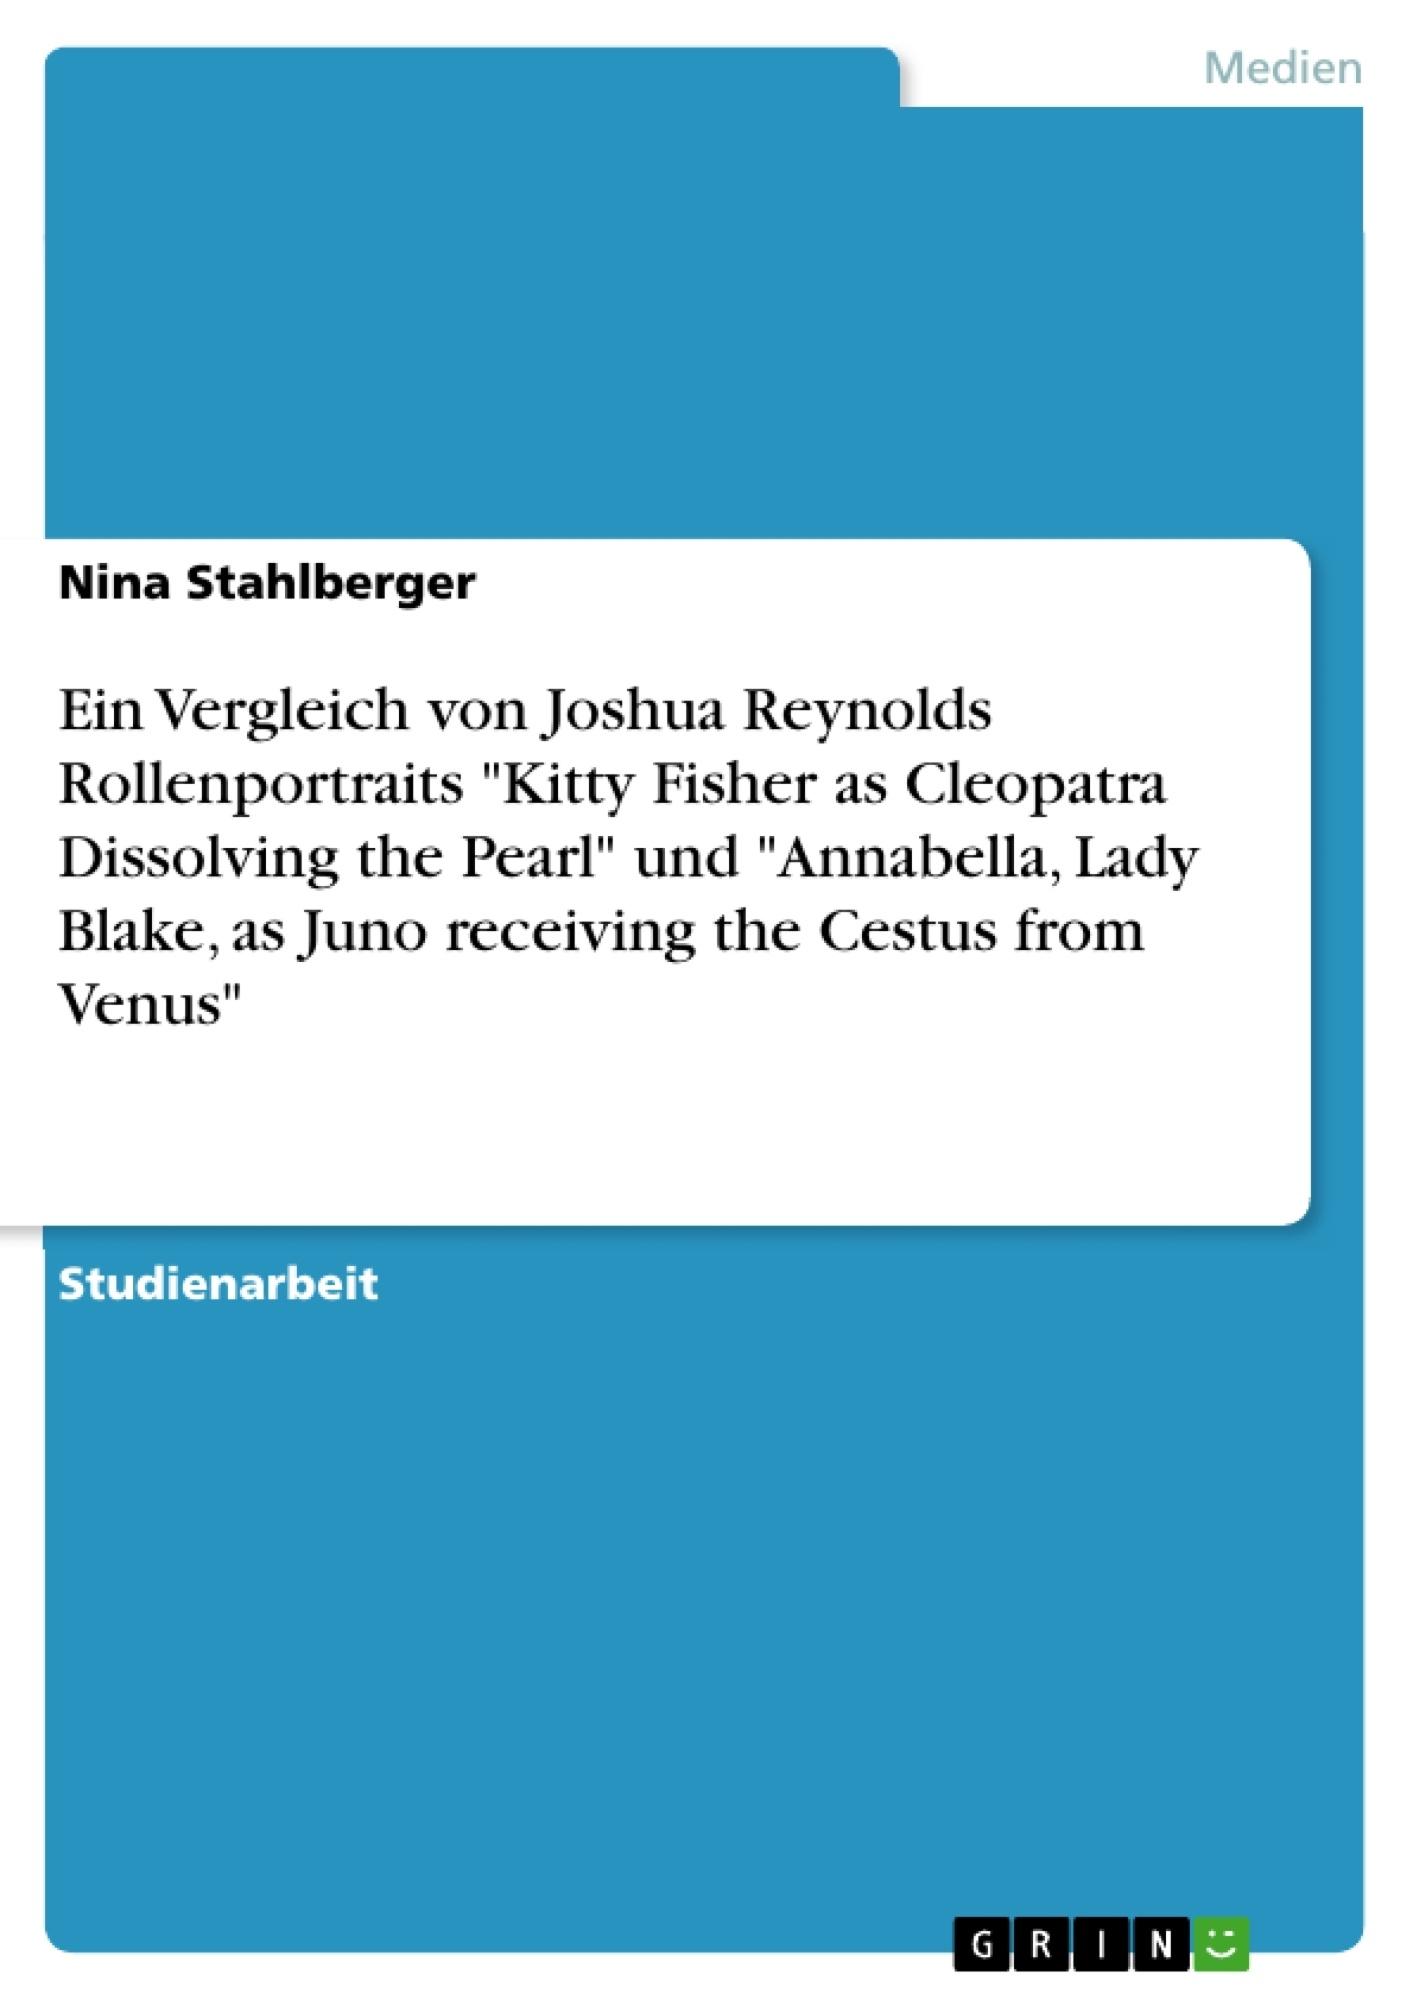 "Titel: Ein Vergleich von Joshua Reynolds Rollenportraits ""Kitty Fisher as Cleopatra Dissolving the Pearl"" und ""Annabella, Lady Blake, as Juno receiving the Cestus from Venus"""